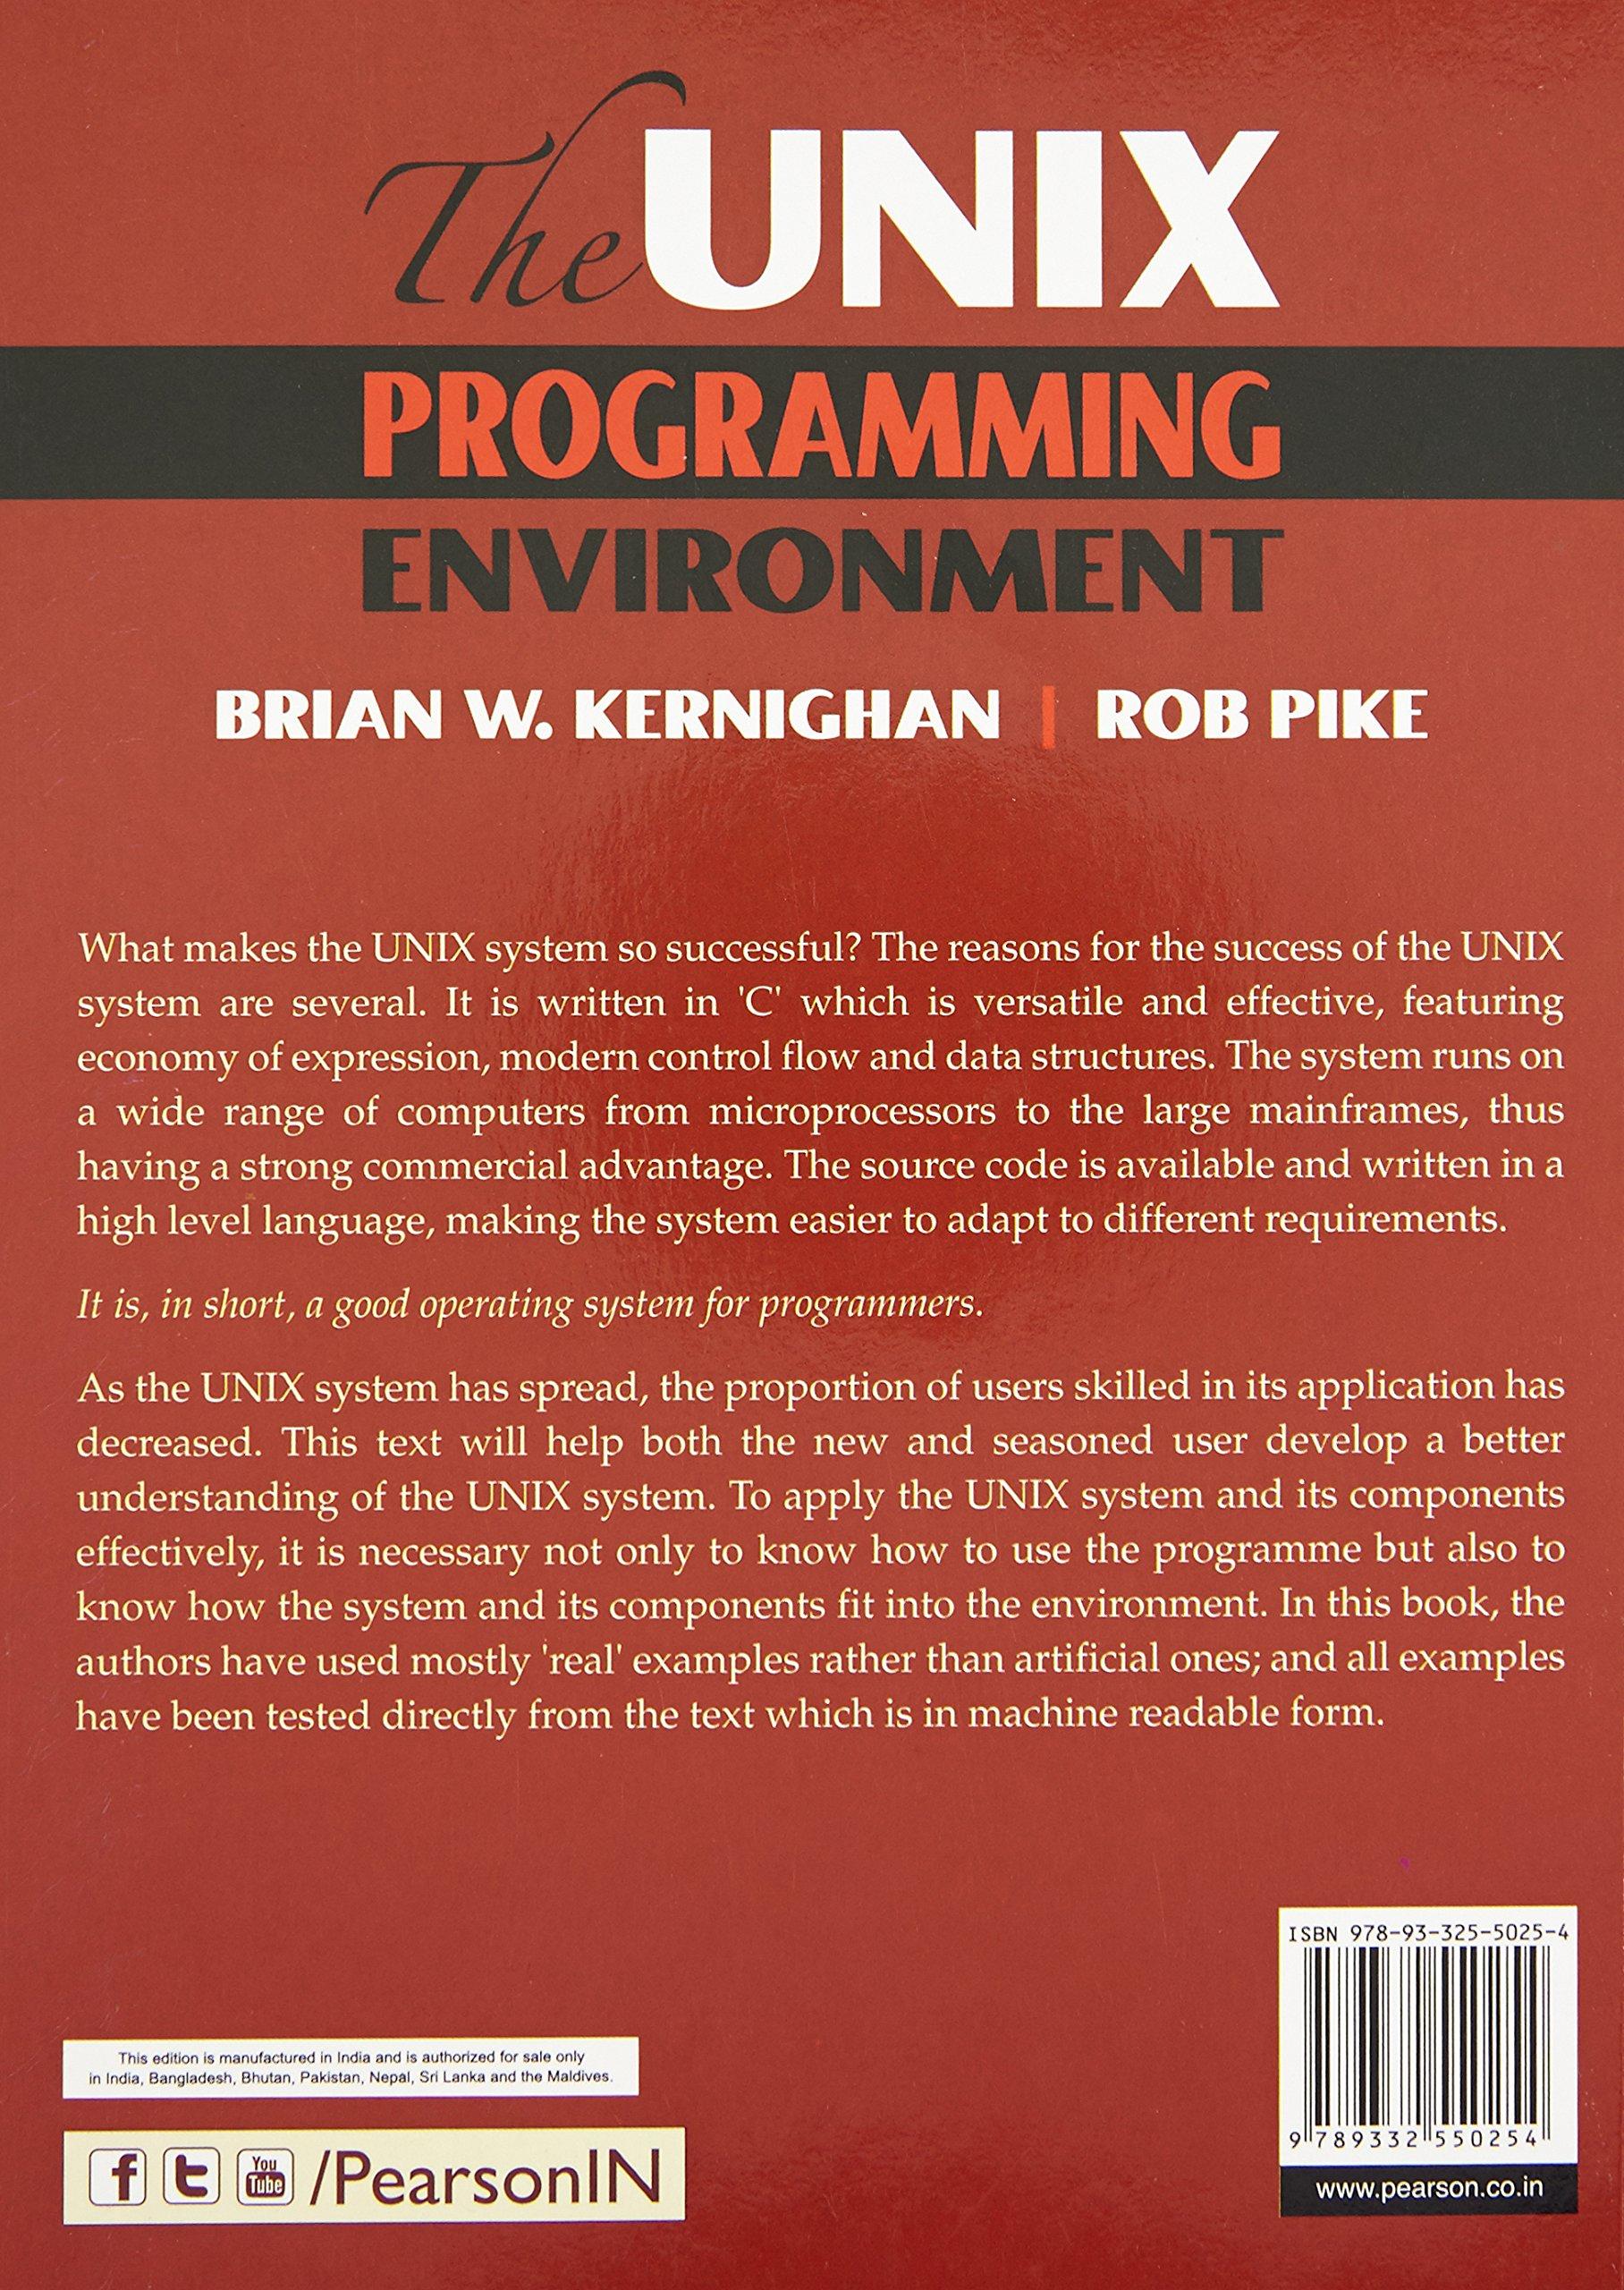 The UNIX Programming Environment: Kernighan & Pike: 9789332550254:  Amazon.com: Books